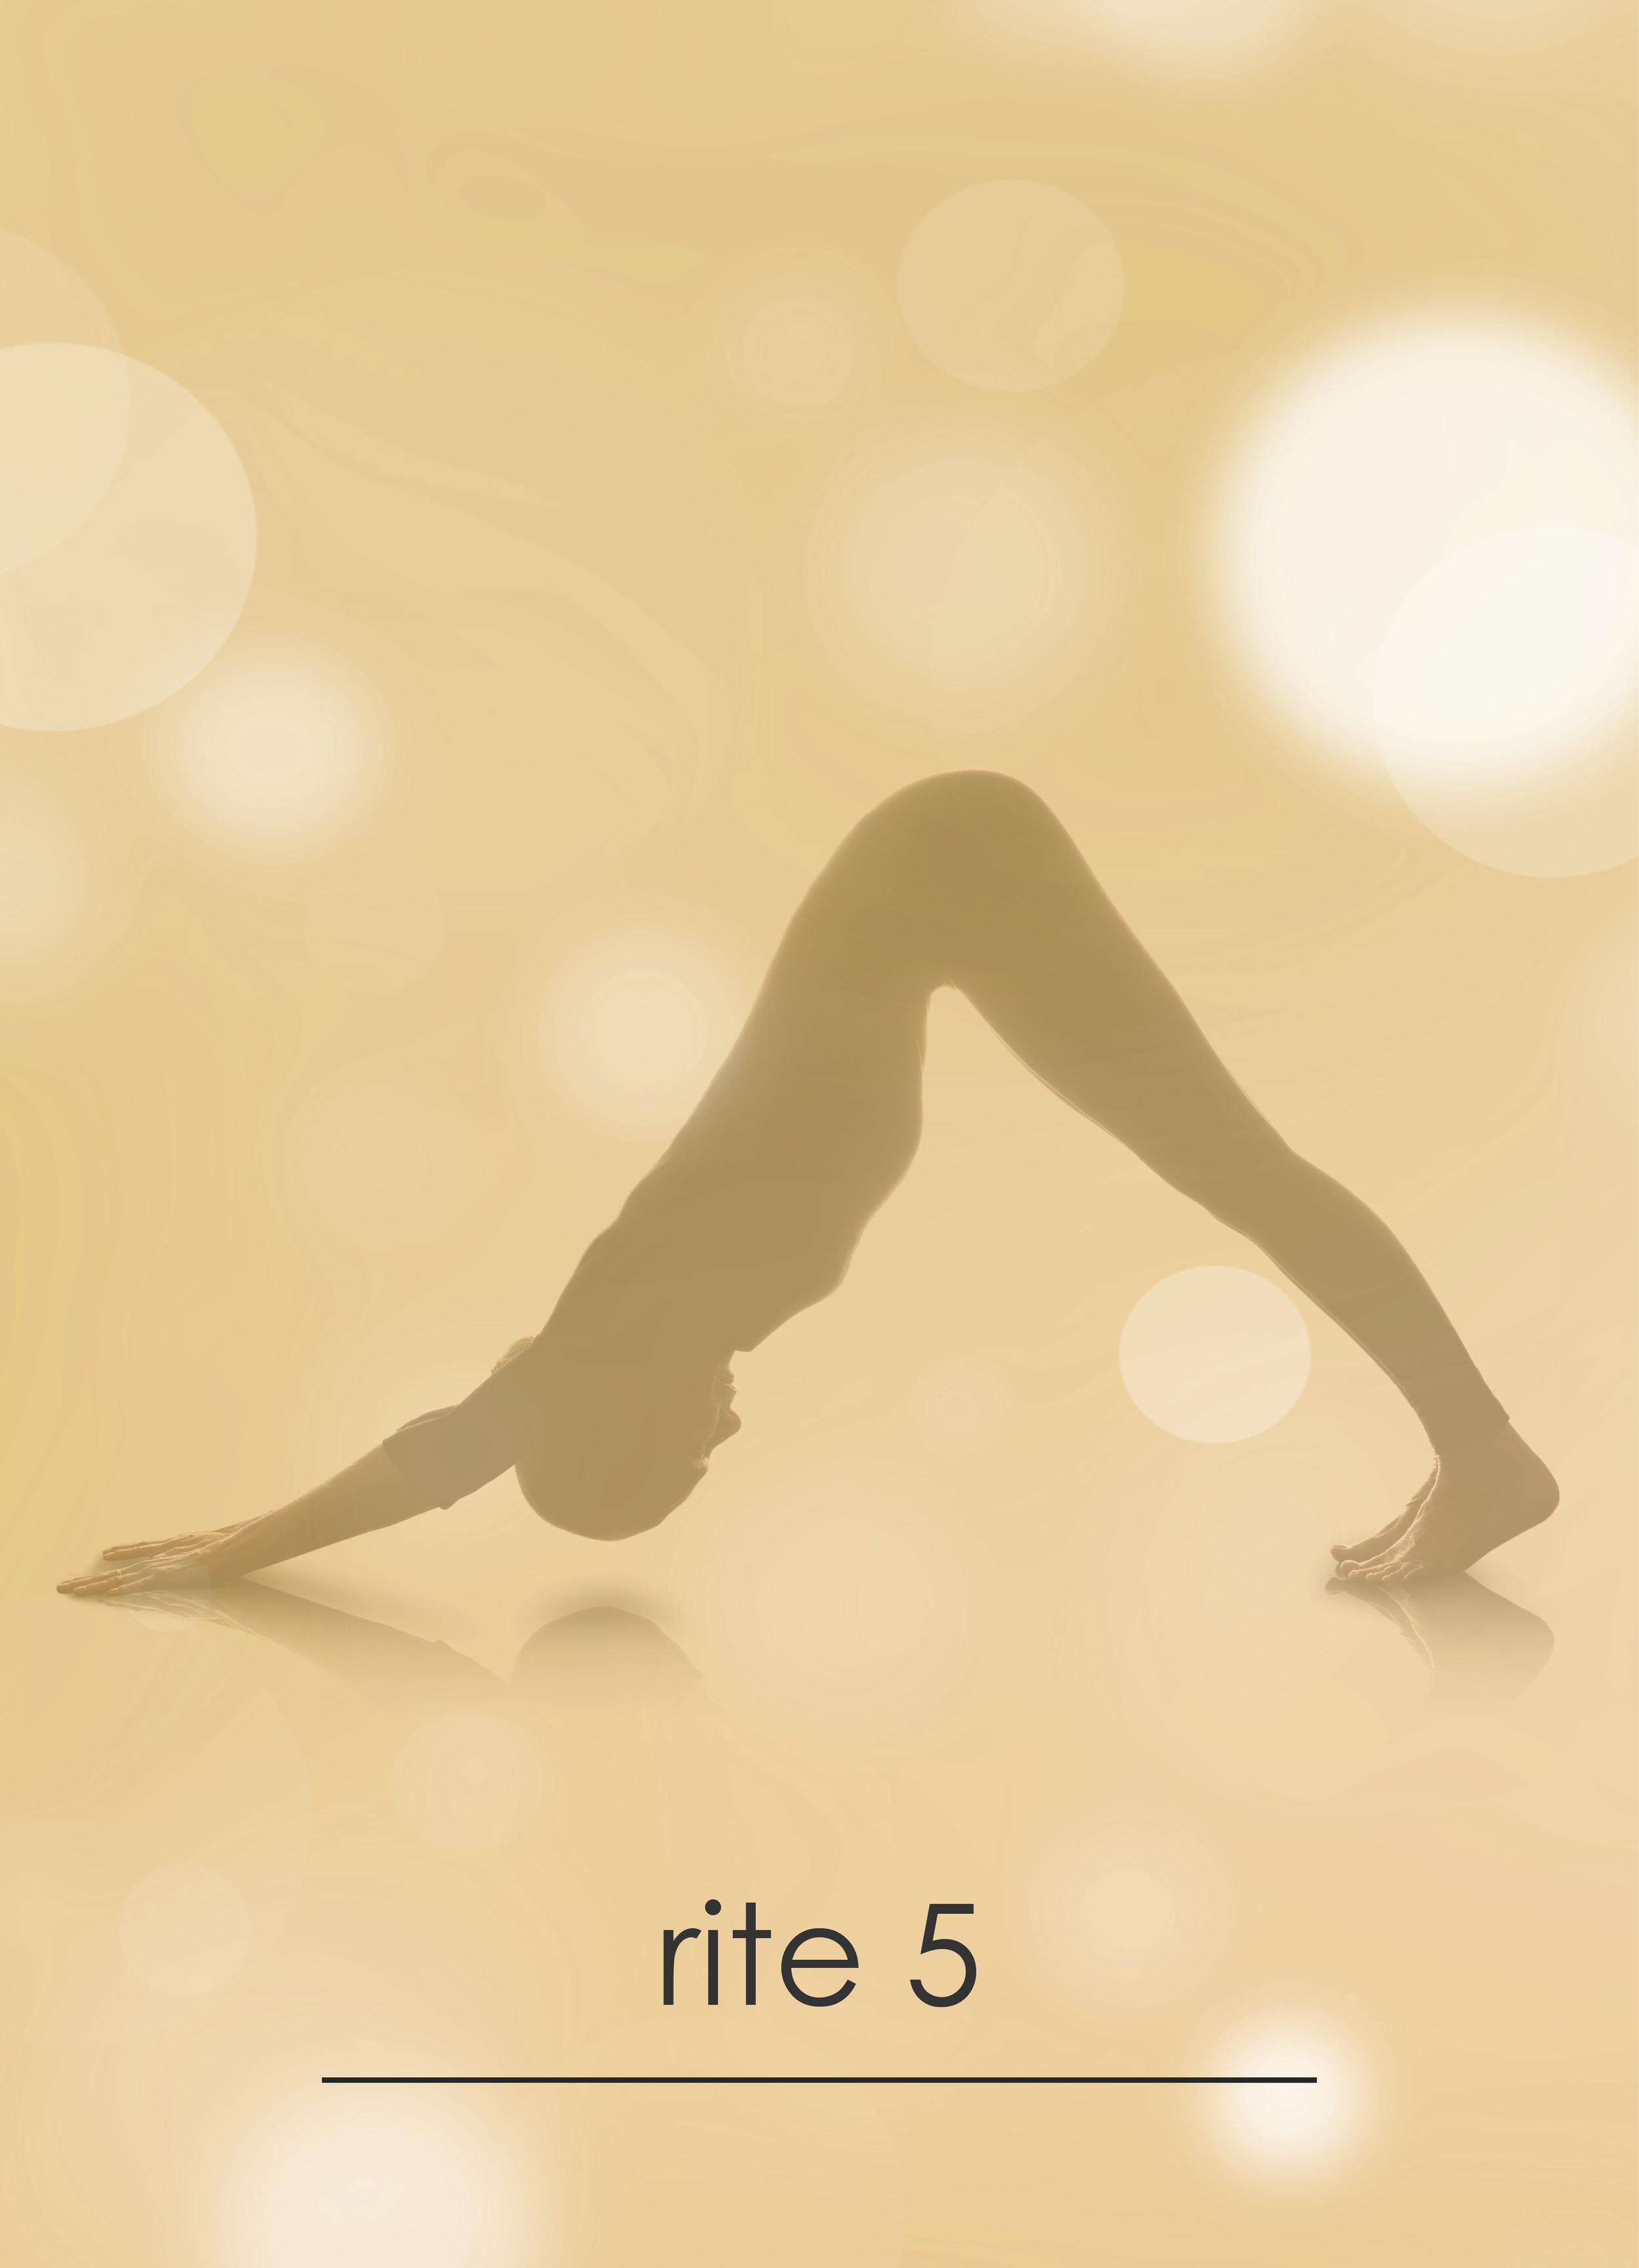 rites_for_life_yoga_rite_5e.jpg